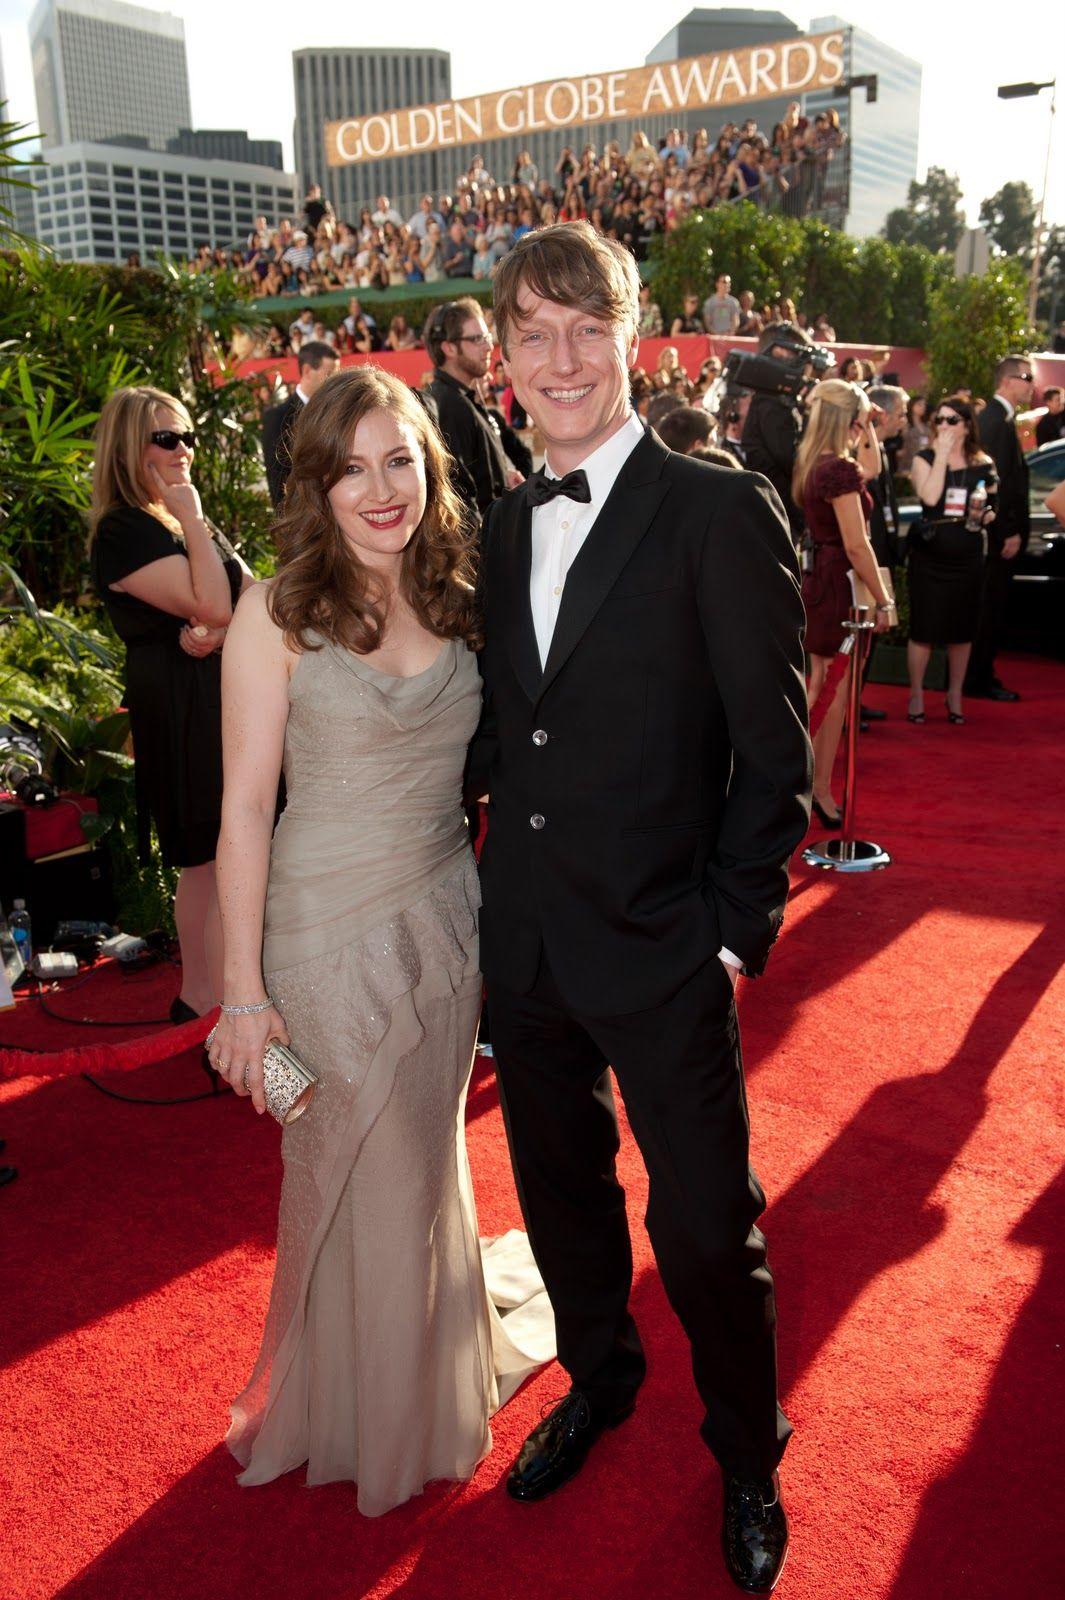 Kelly MacDonald & Dougie Payne - married since '03 :-)